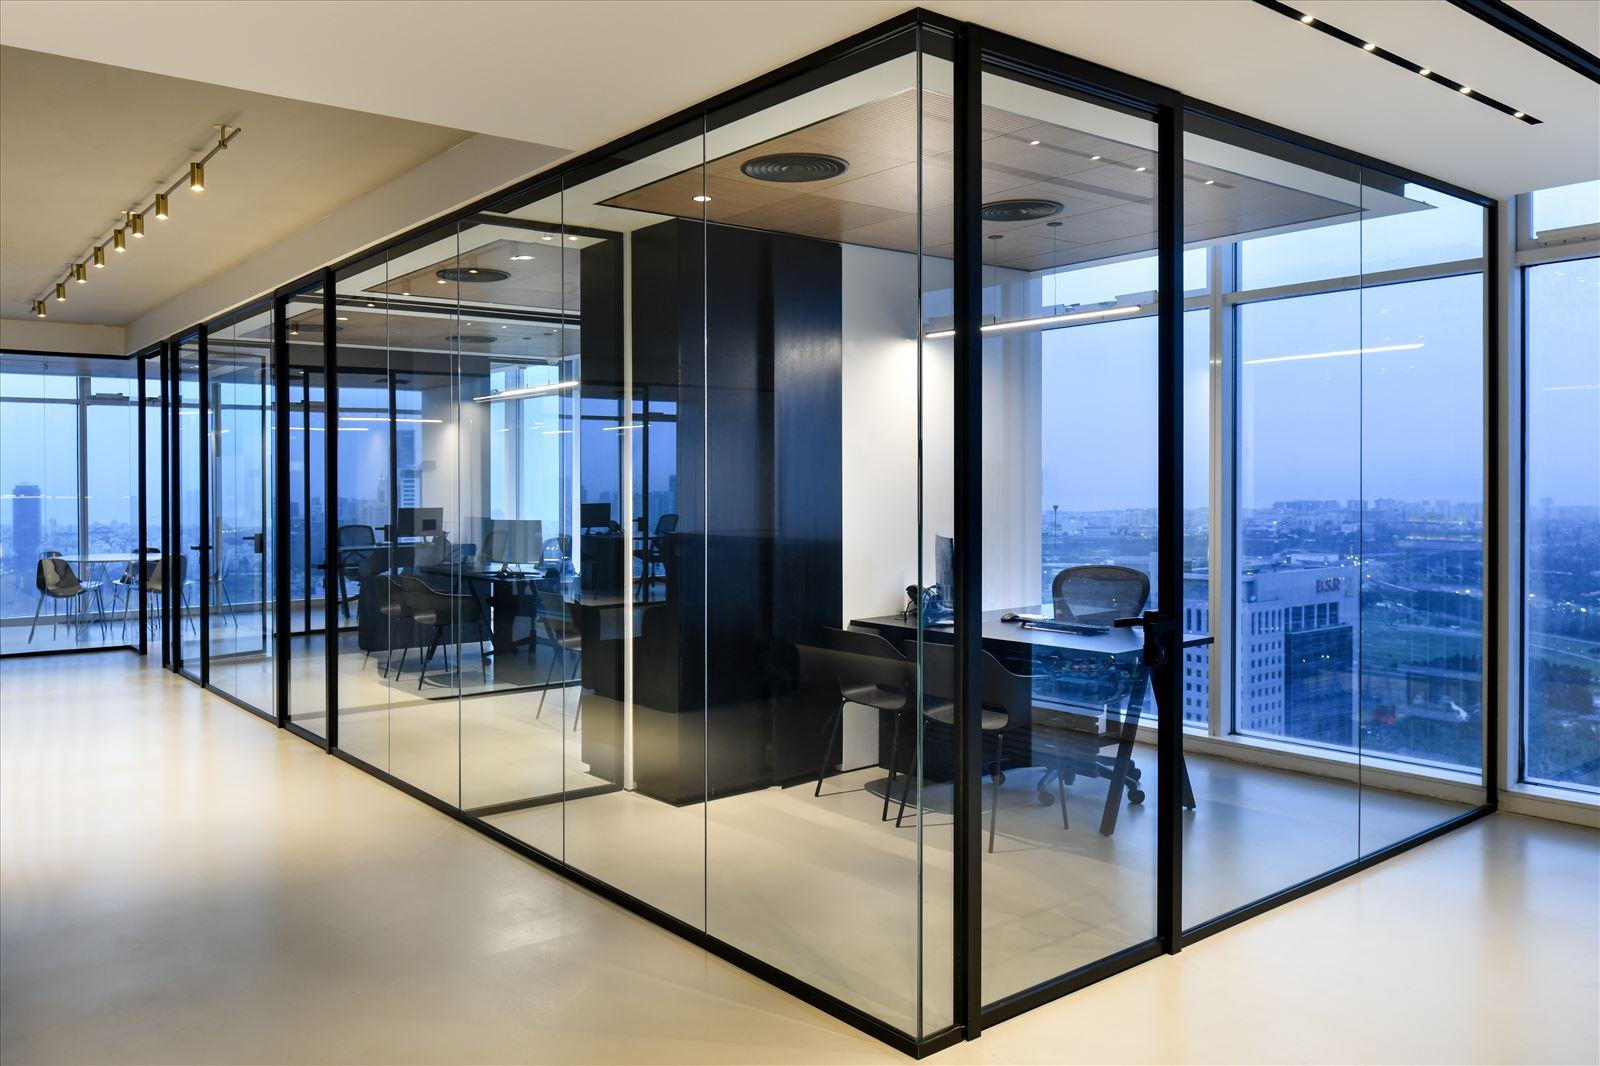 Divident office מסדרונות מעוצבים בגופי תאורה על ידי קמחי תאורה